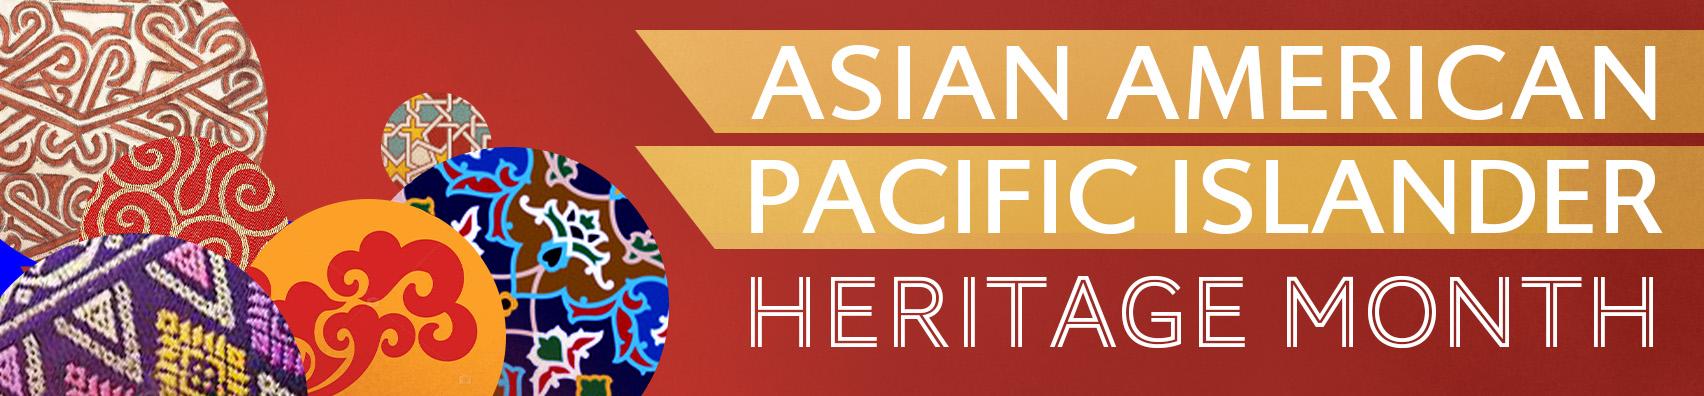 Asian-American Banner